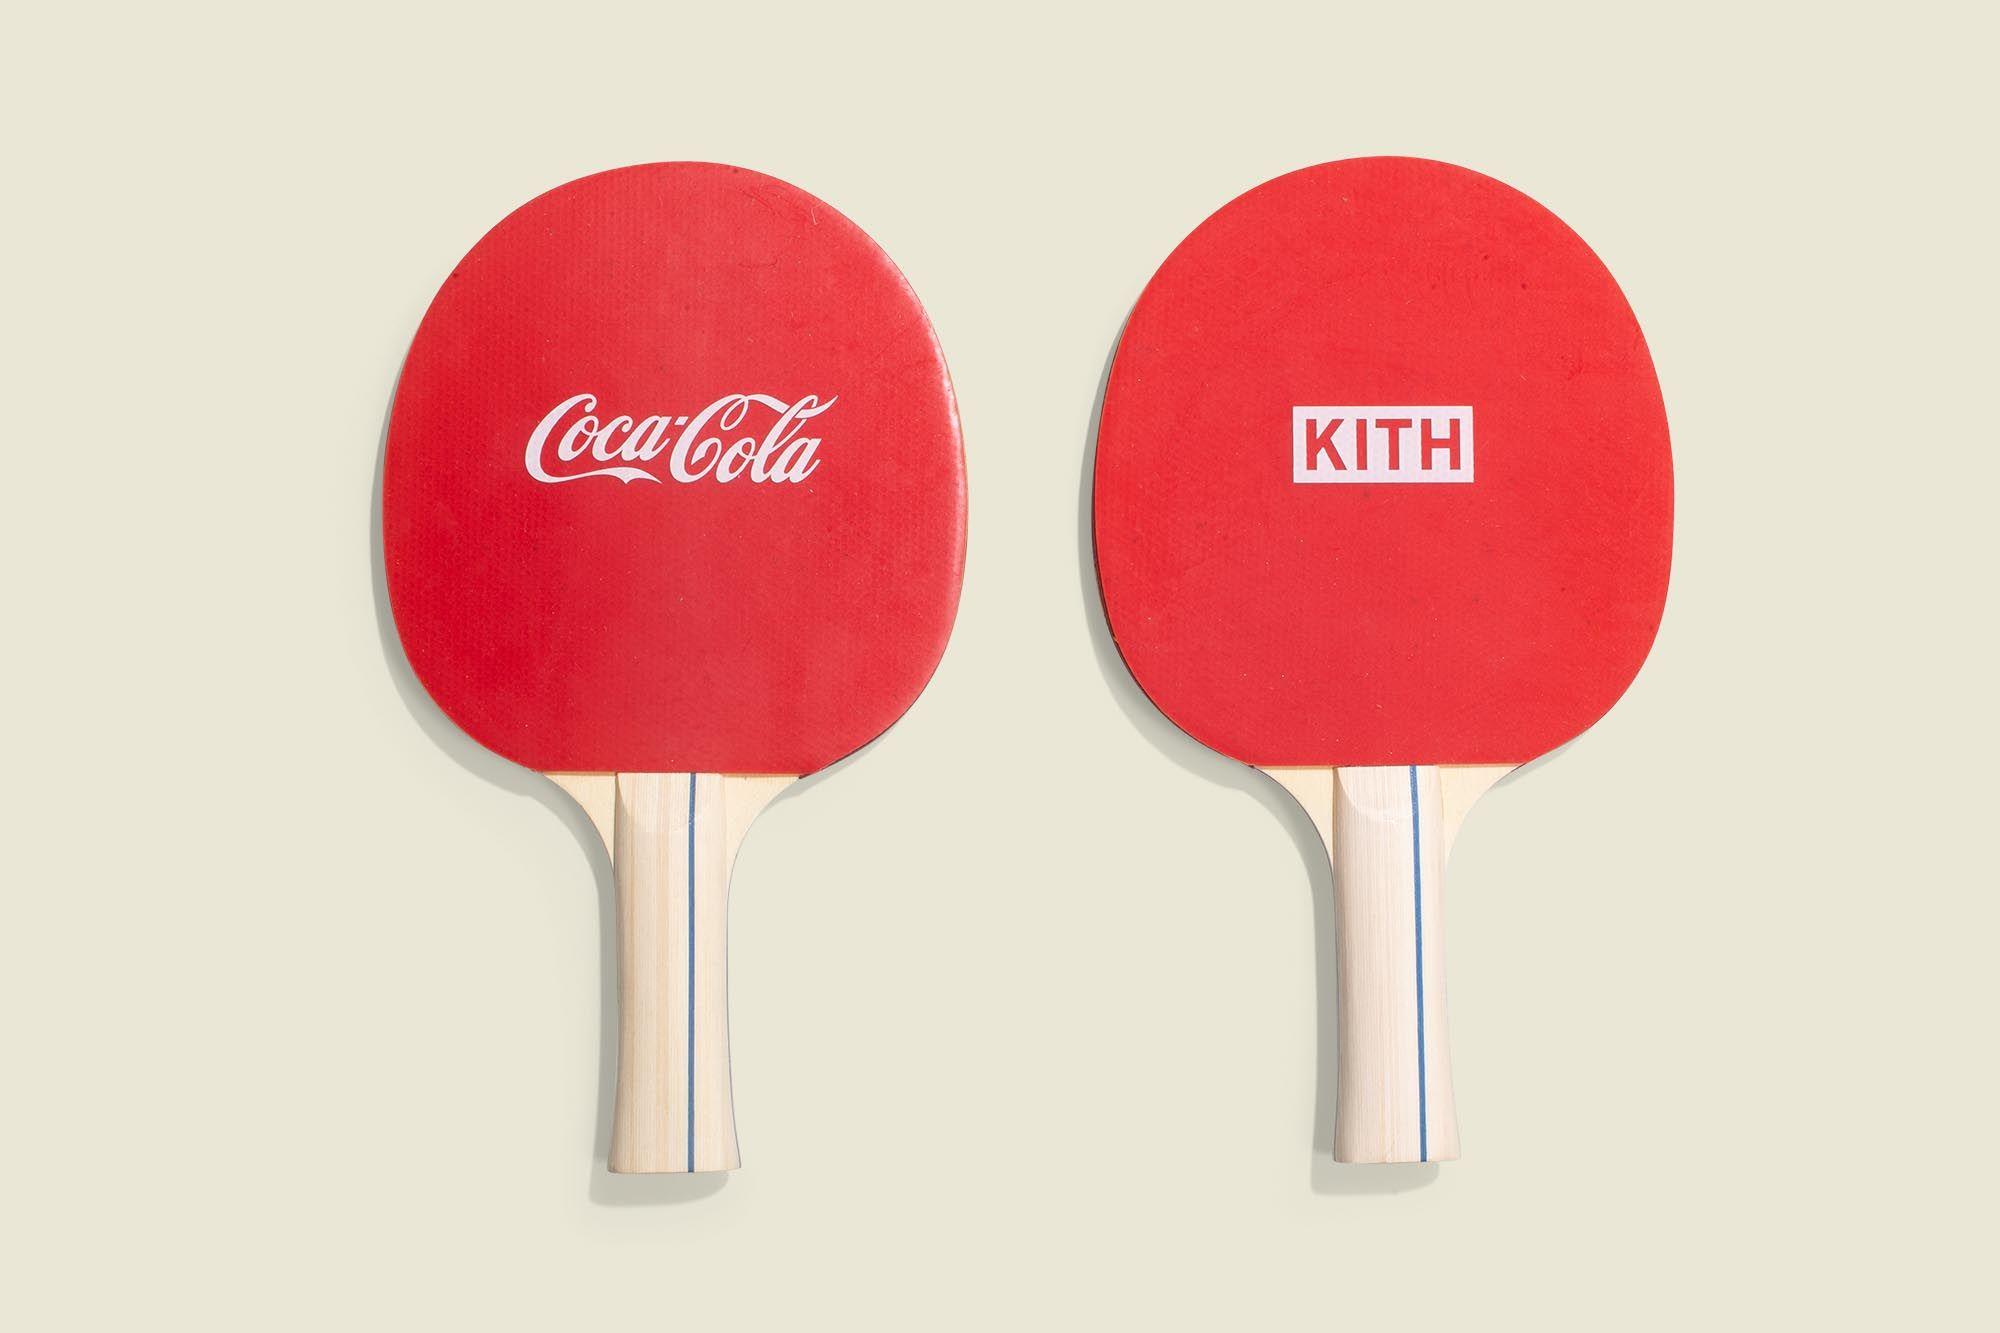 Ping pong rackets